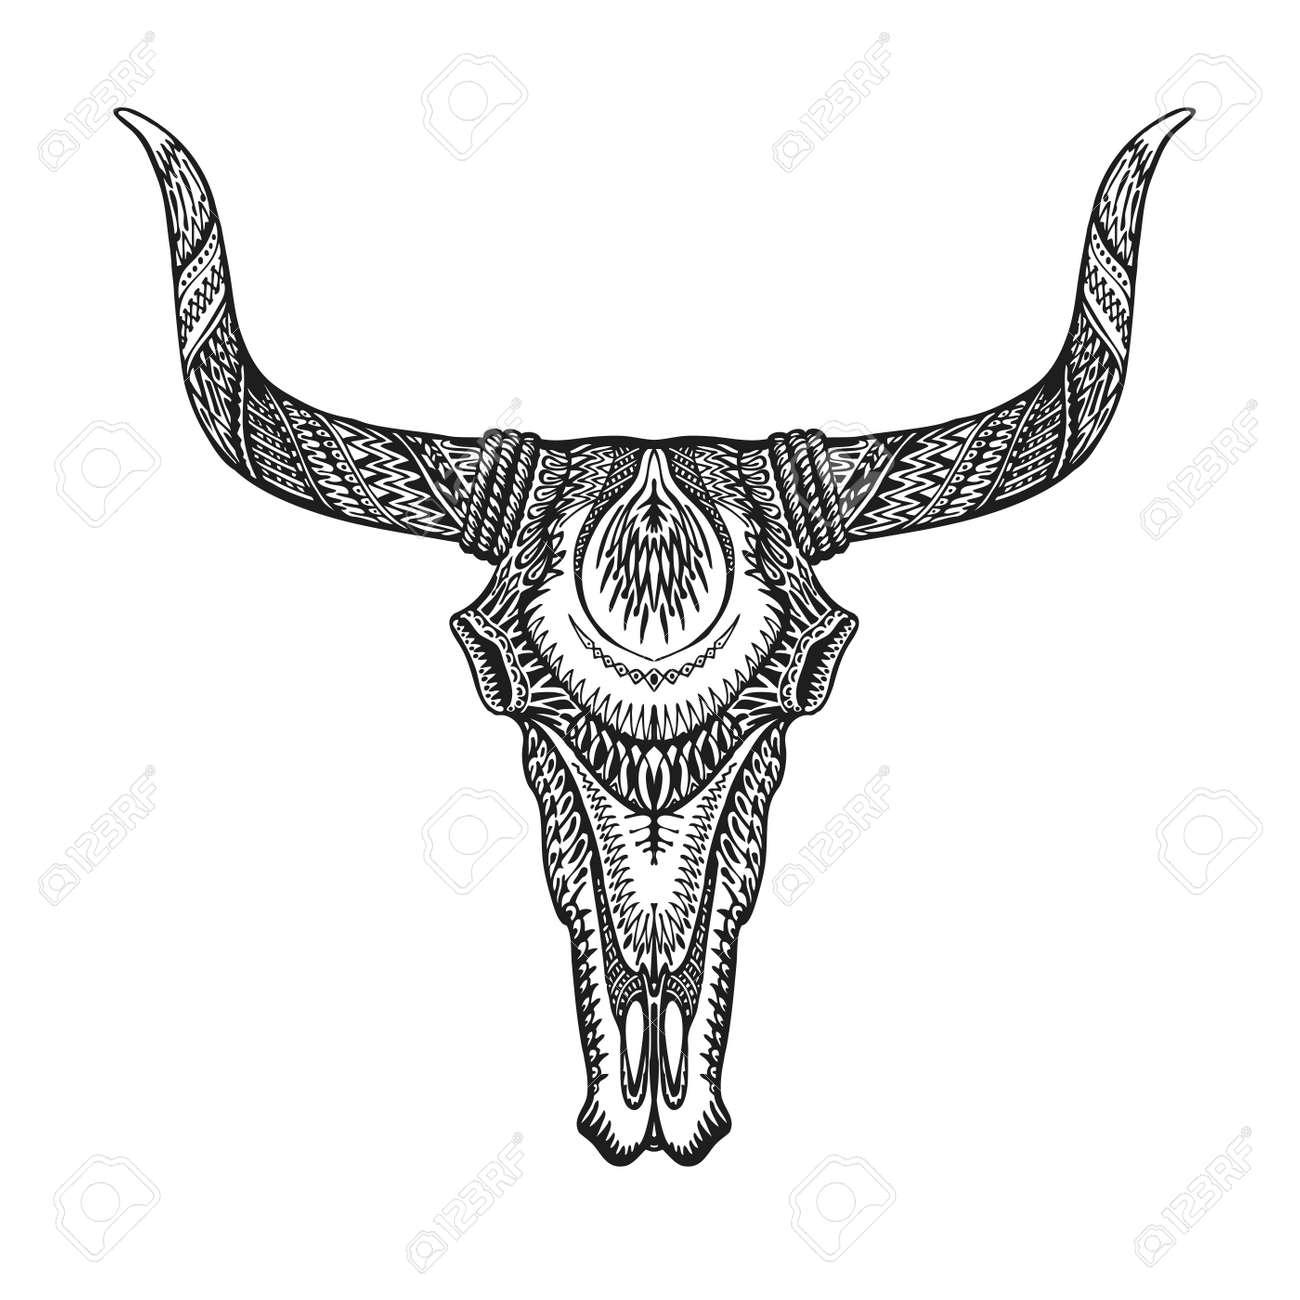 Decorative Bull Skull In Tattoo Tribal Style Hand Drawn Vector